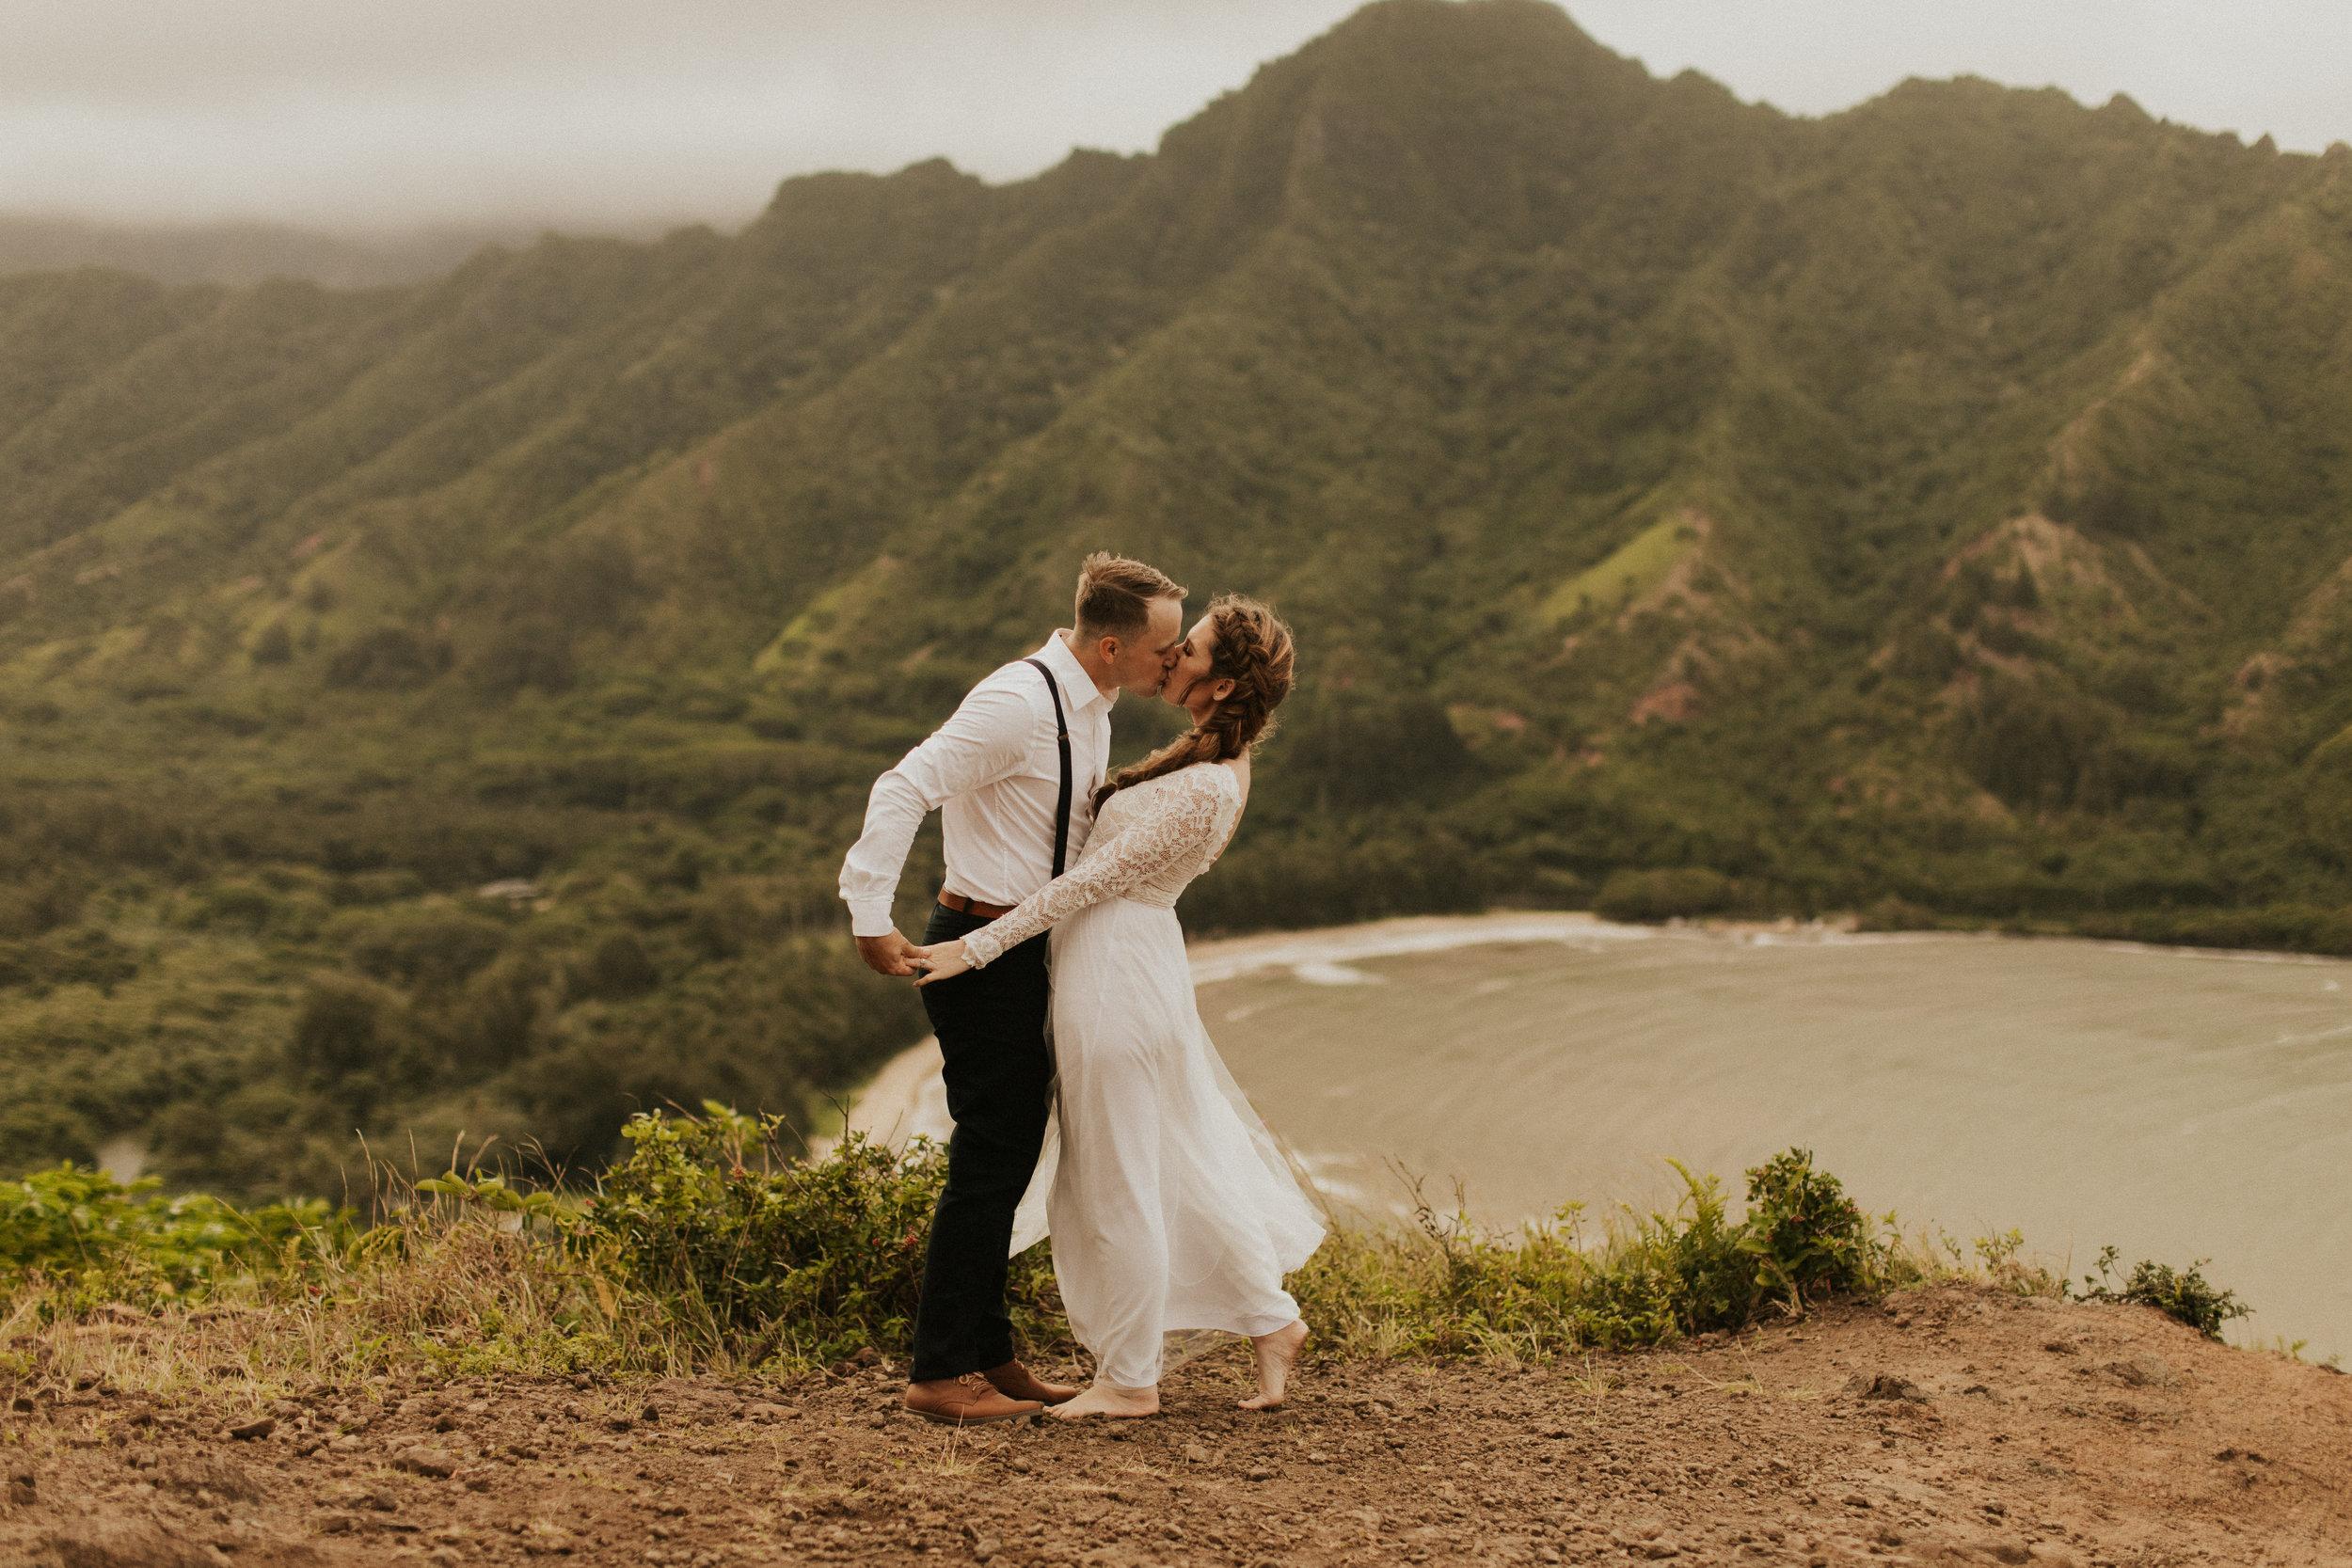 the-mclachlans-destination-elopement-photographers-mountain-hike-sena-eric-44.jpg